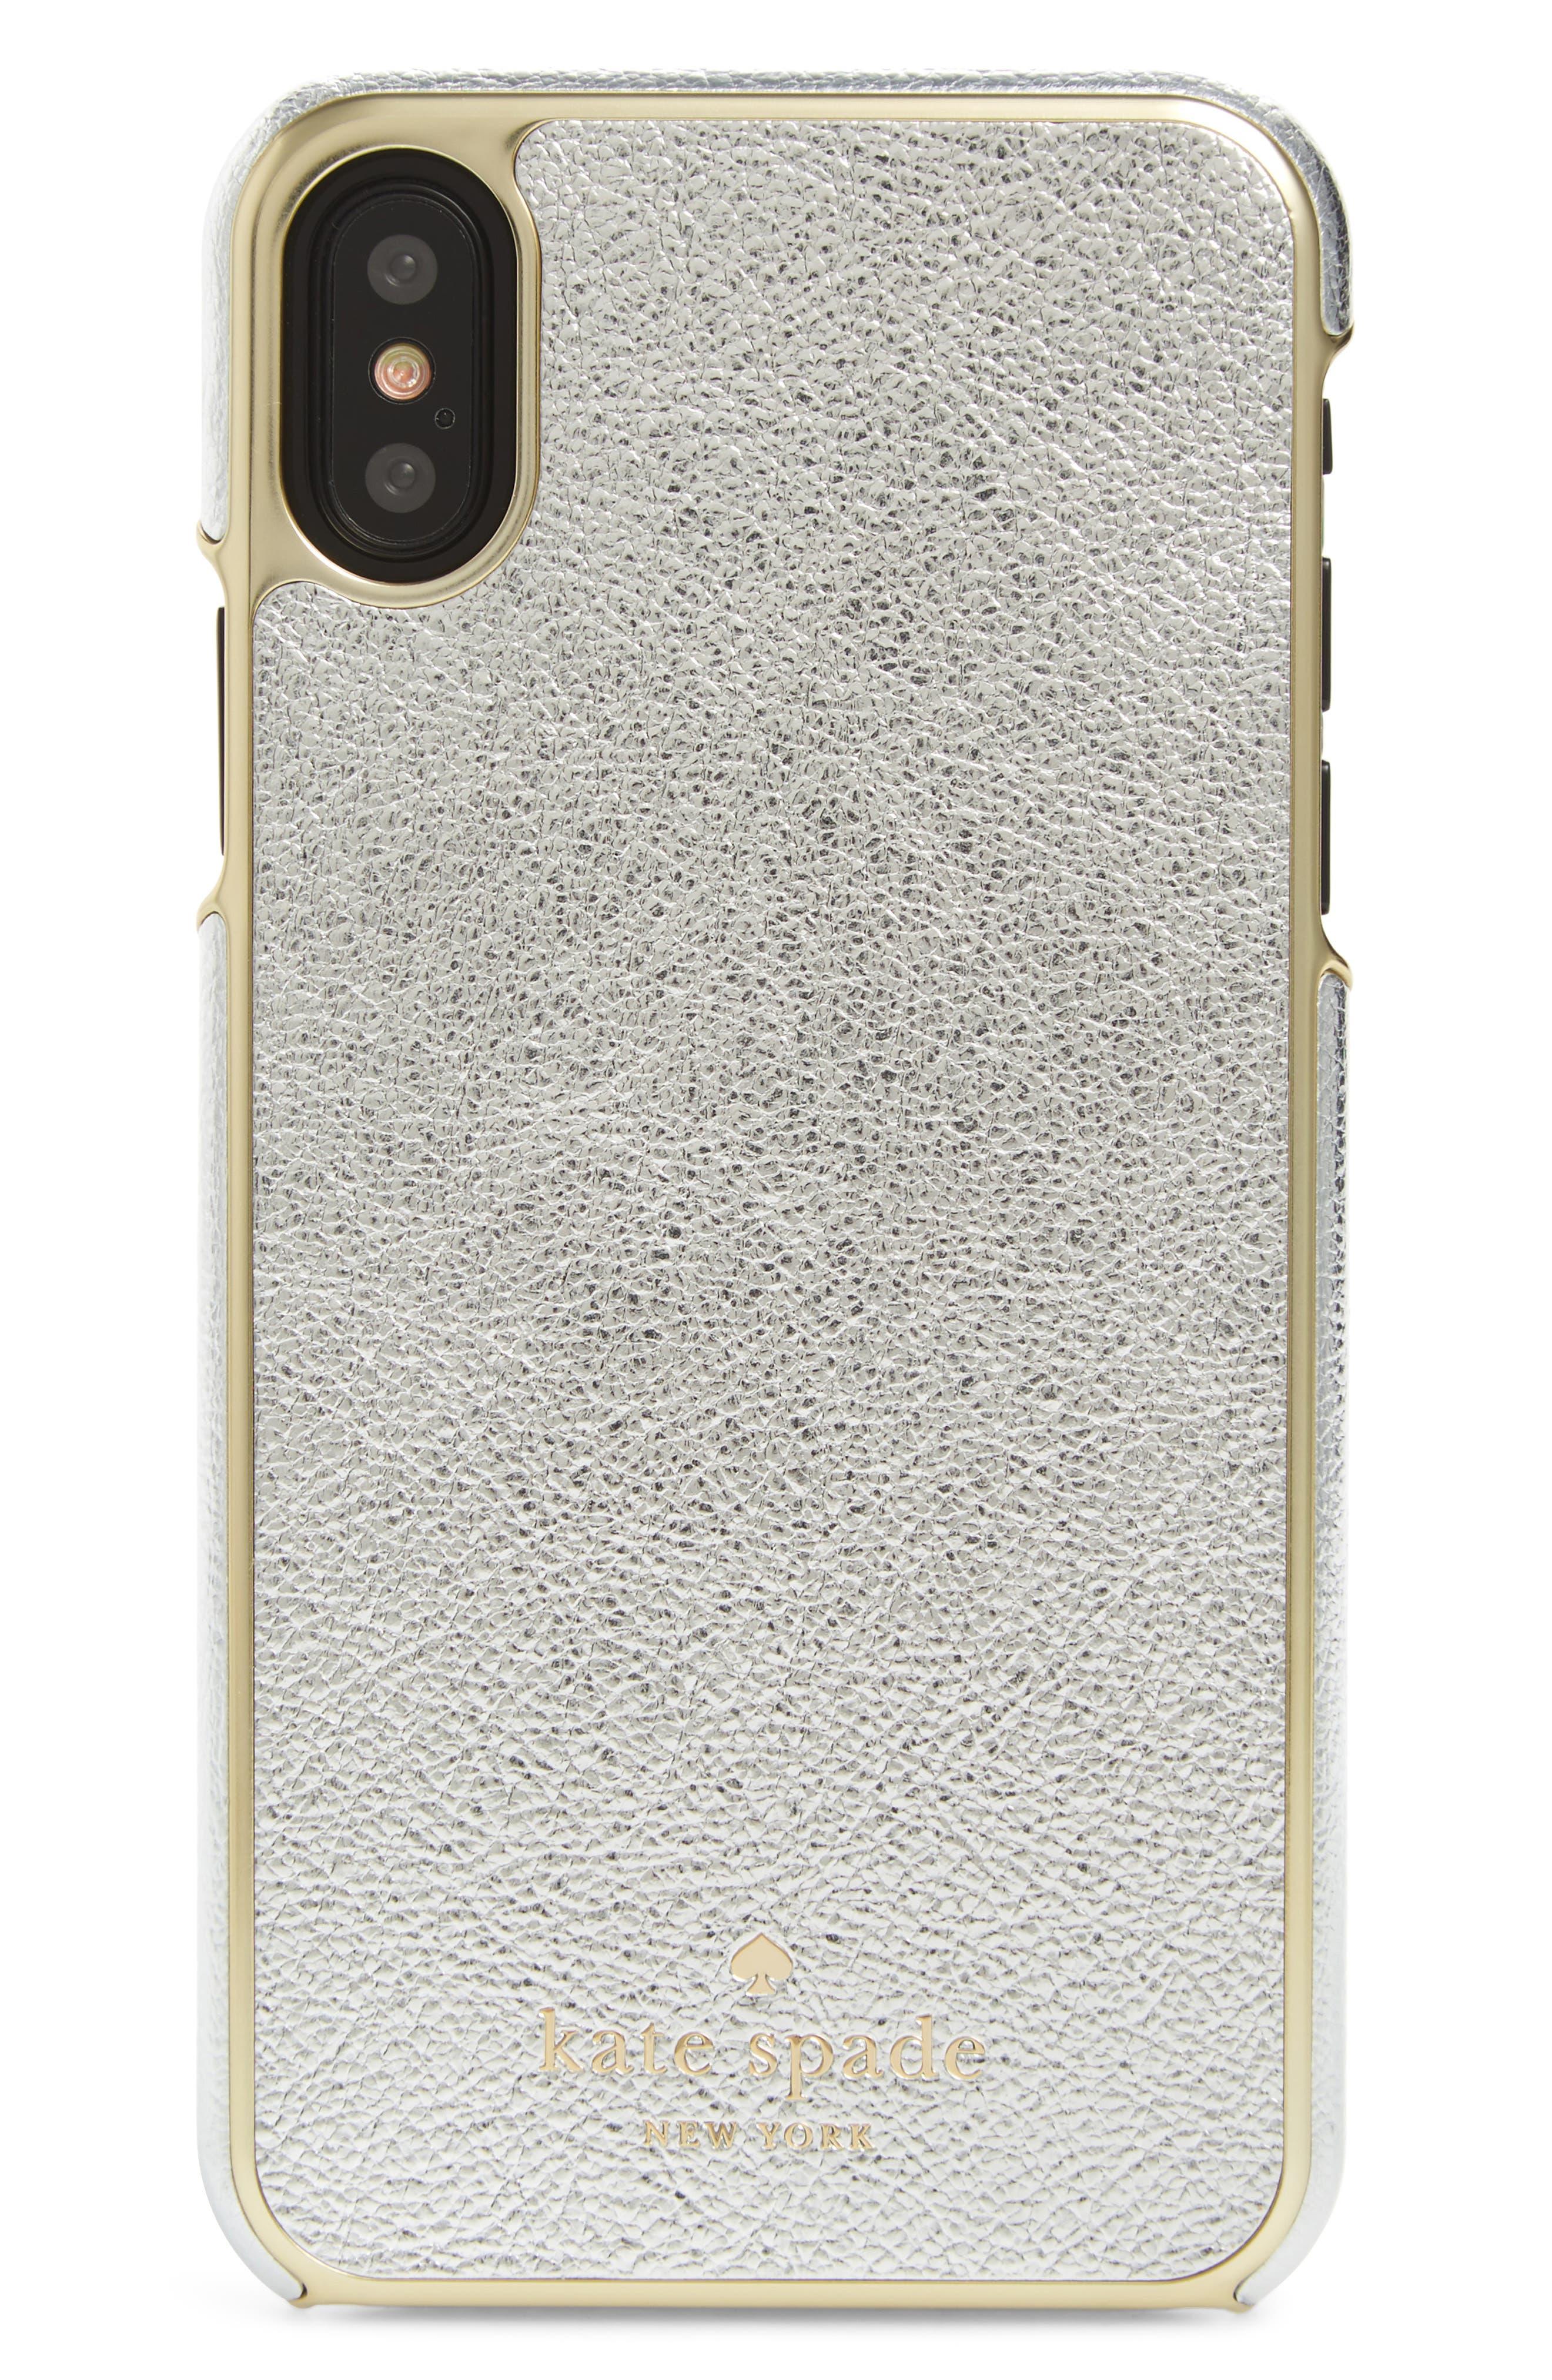 kate spade new york iPhone 7/8 & 7/8 plus case